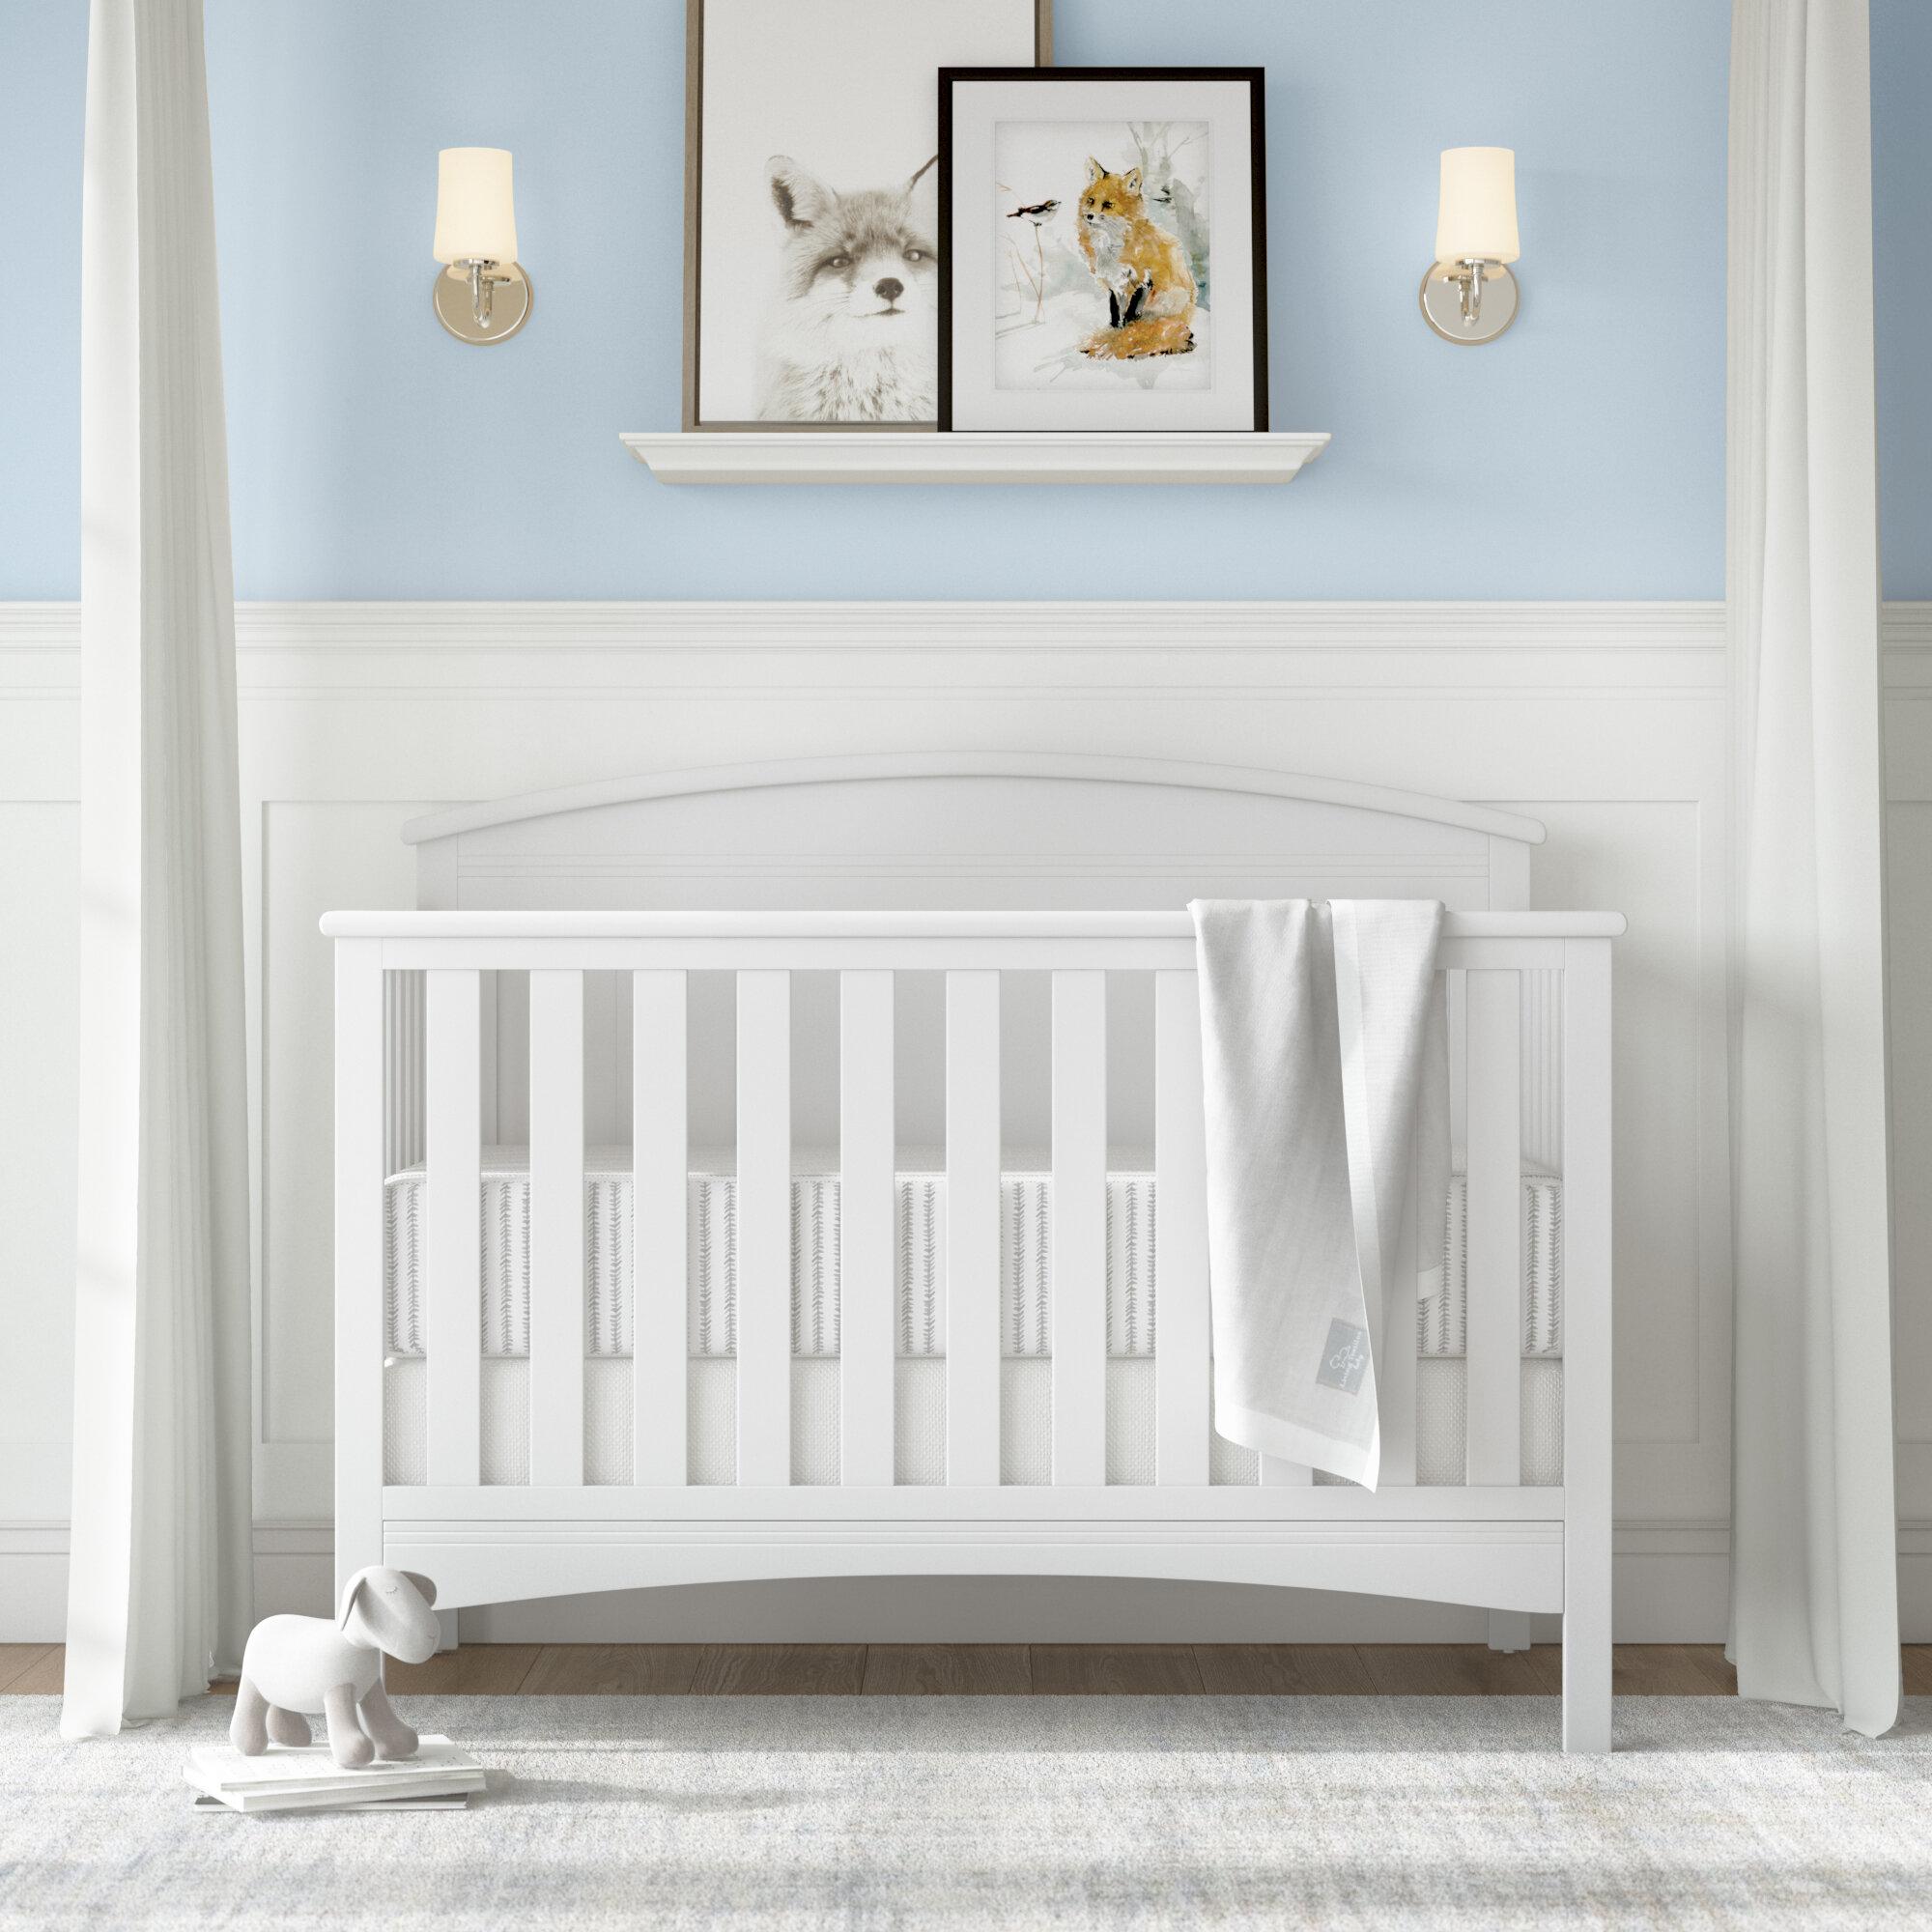 Wayfair   Modern & Contemporary White Cribs You'll Love in 21